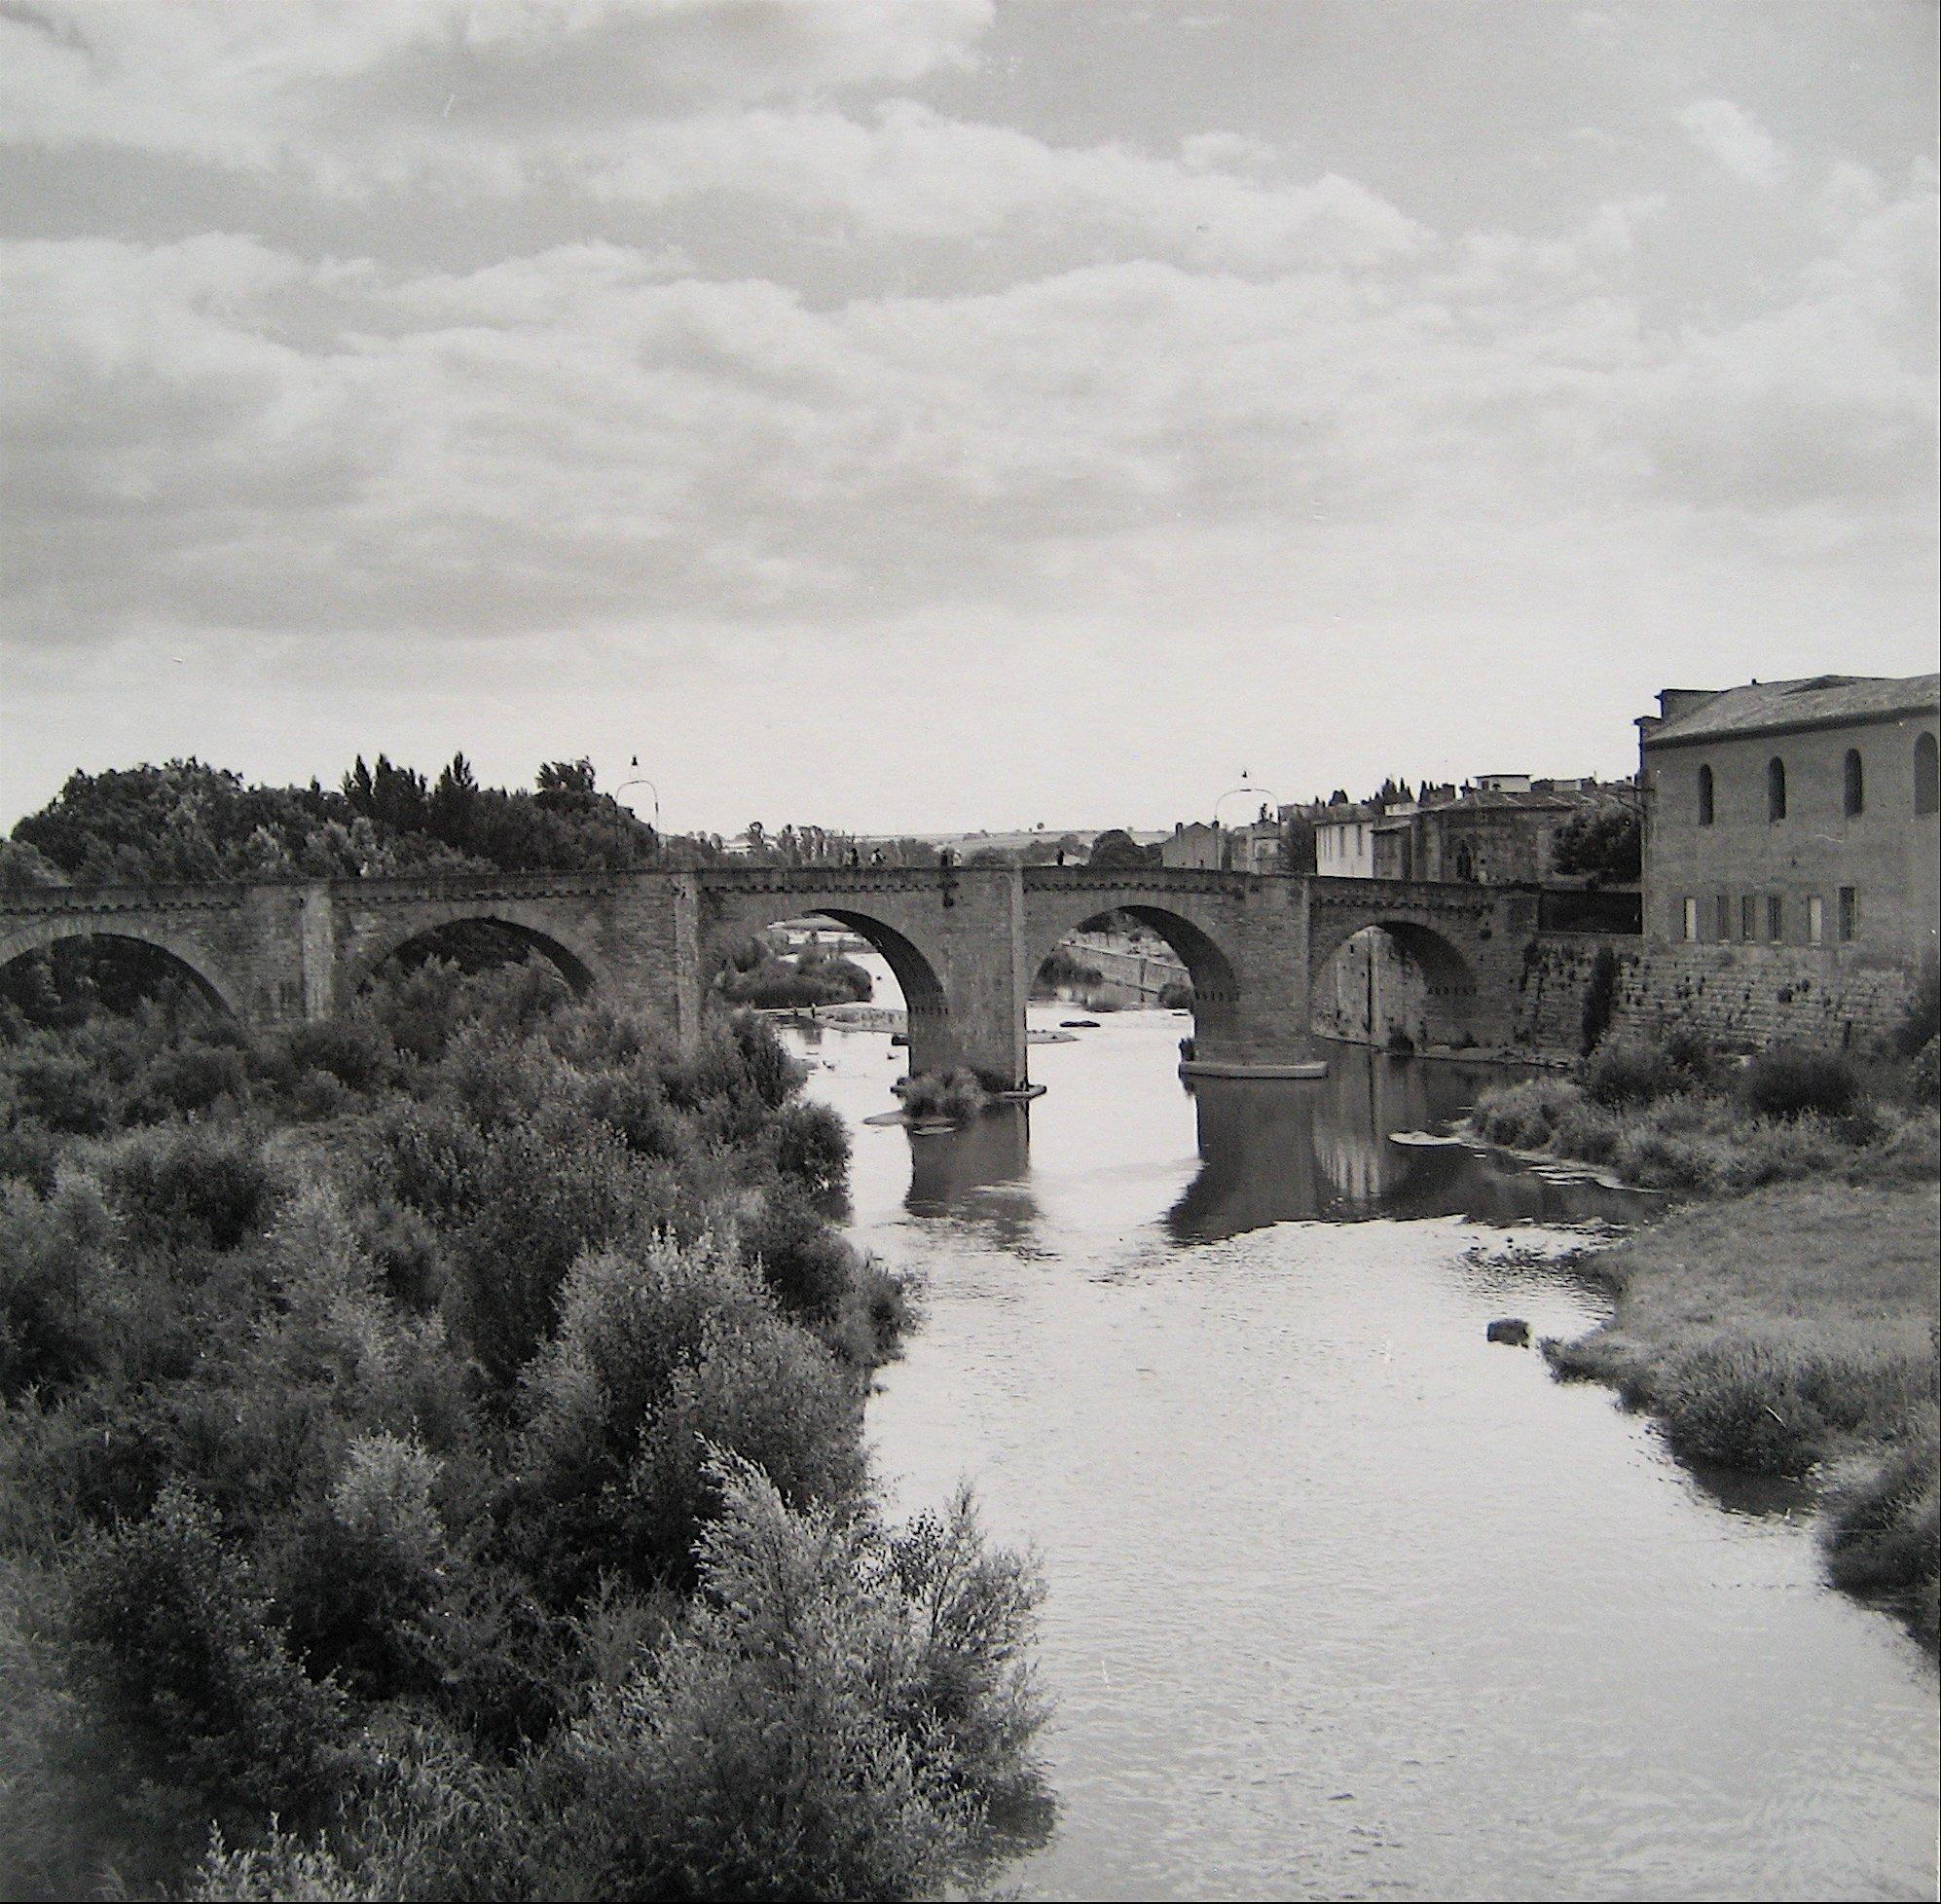 European Bridge Over Water 1960s Black and White Photograph